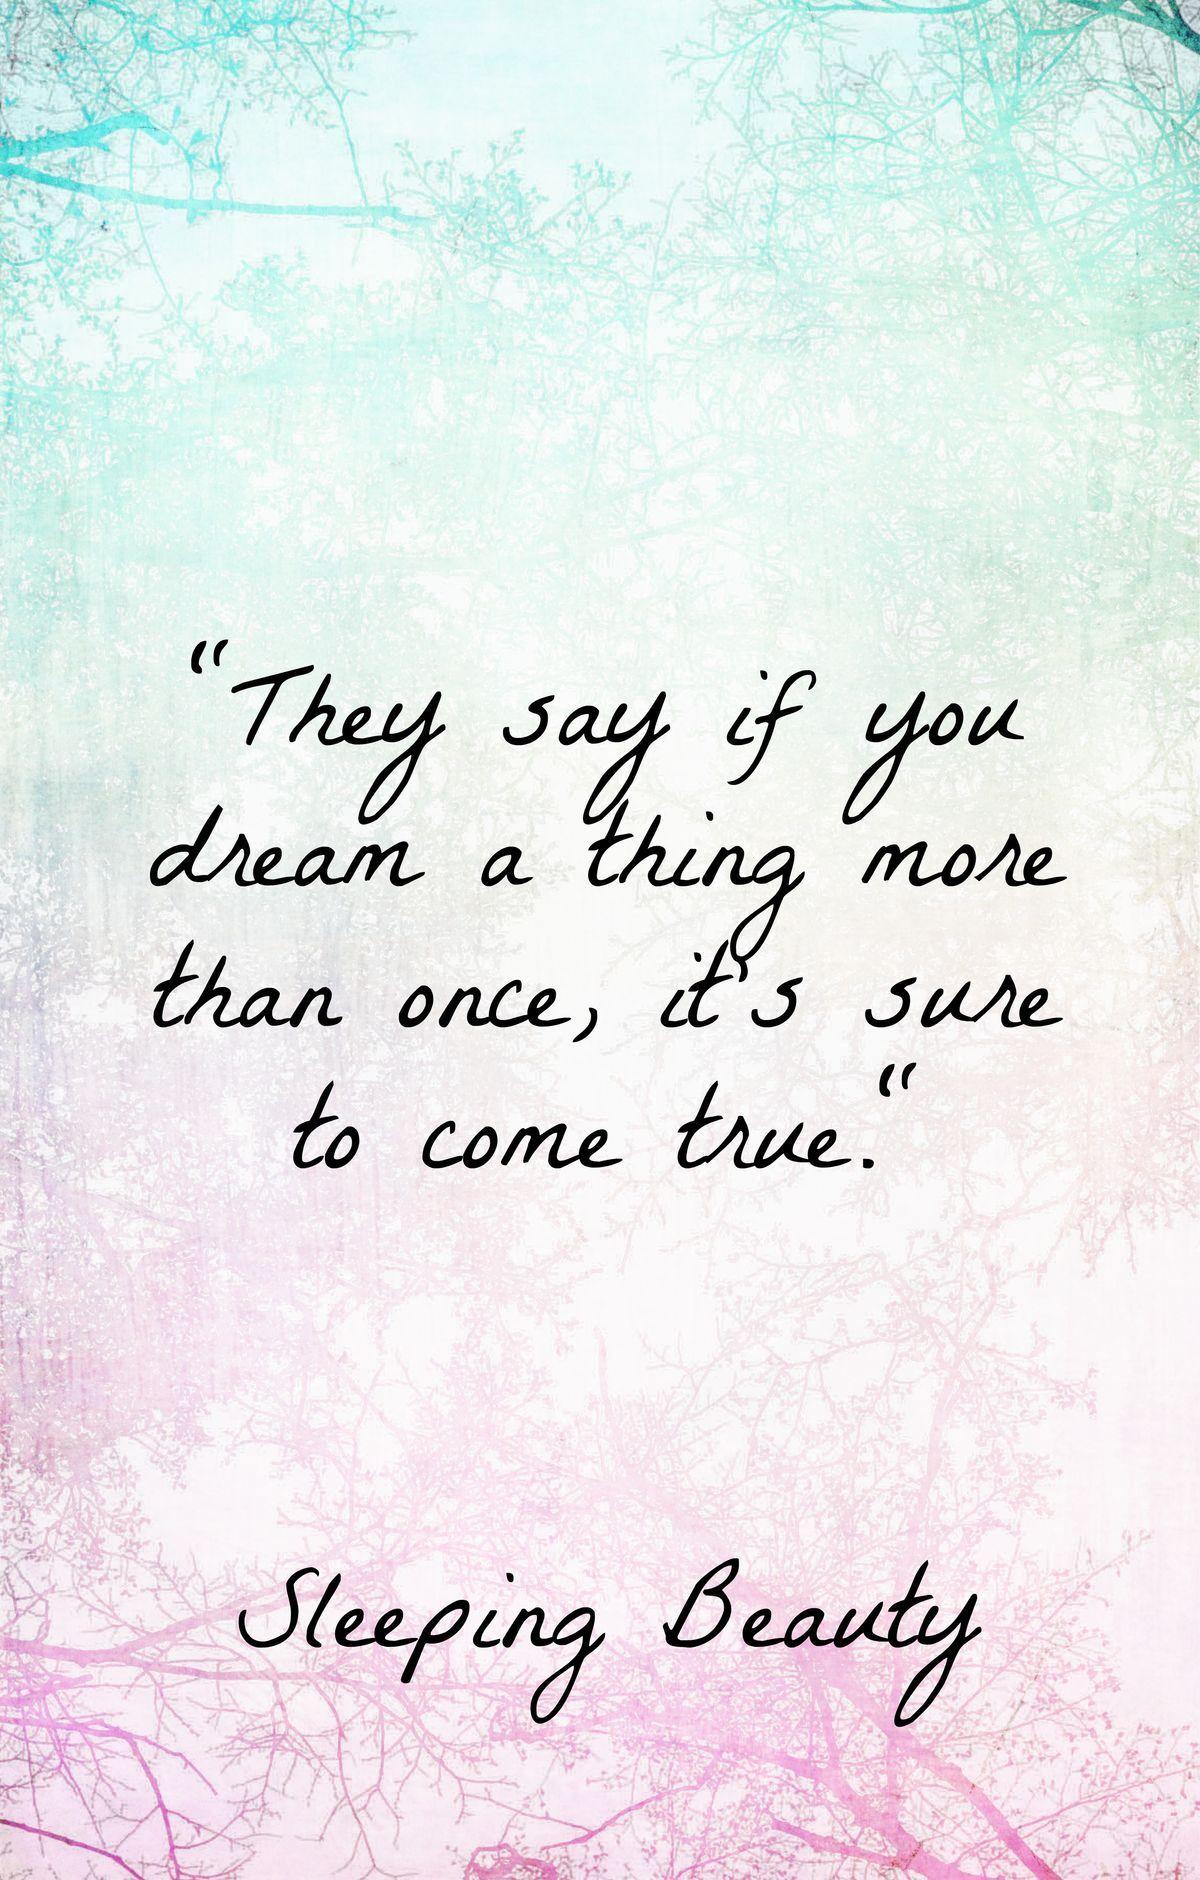 Sleeping Beauty S Got It Right Disney Quotes Sleeping Beauty Quotes Quotes Disney